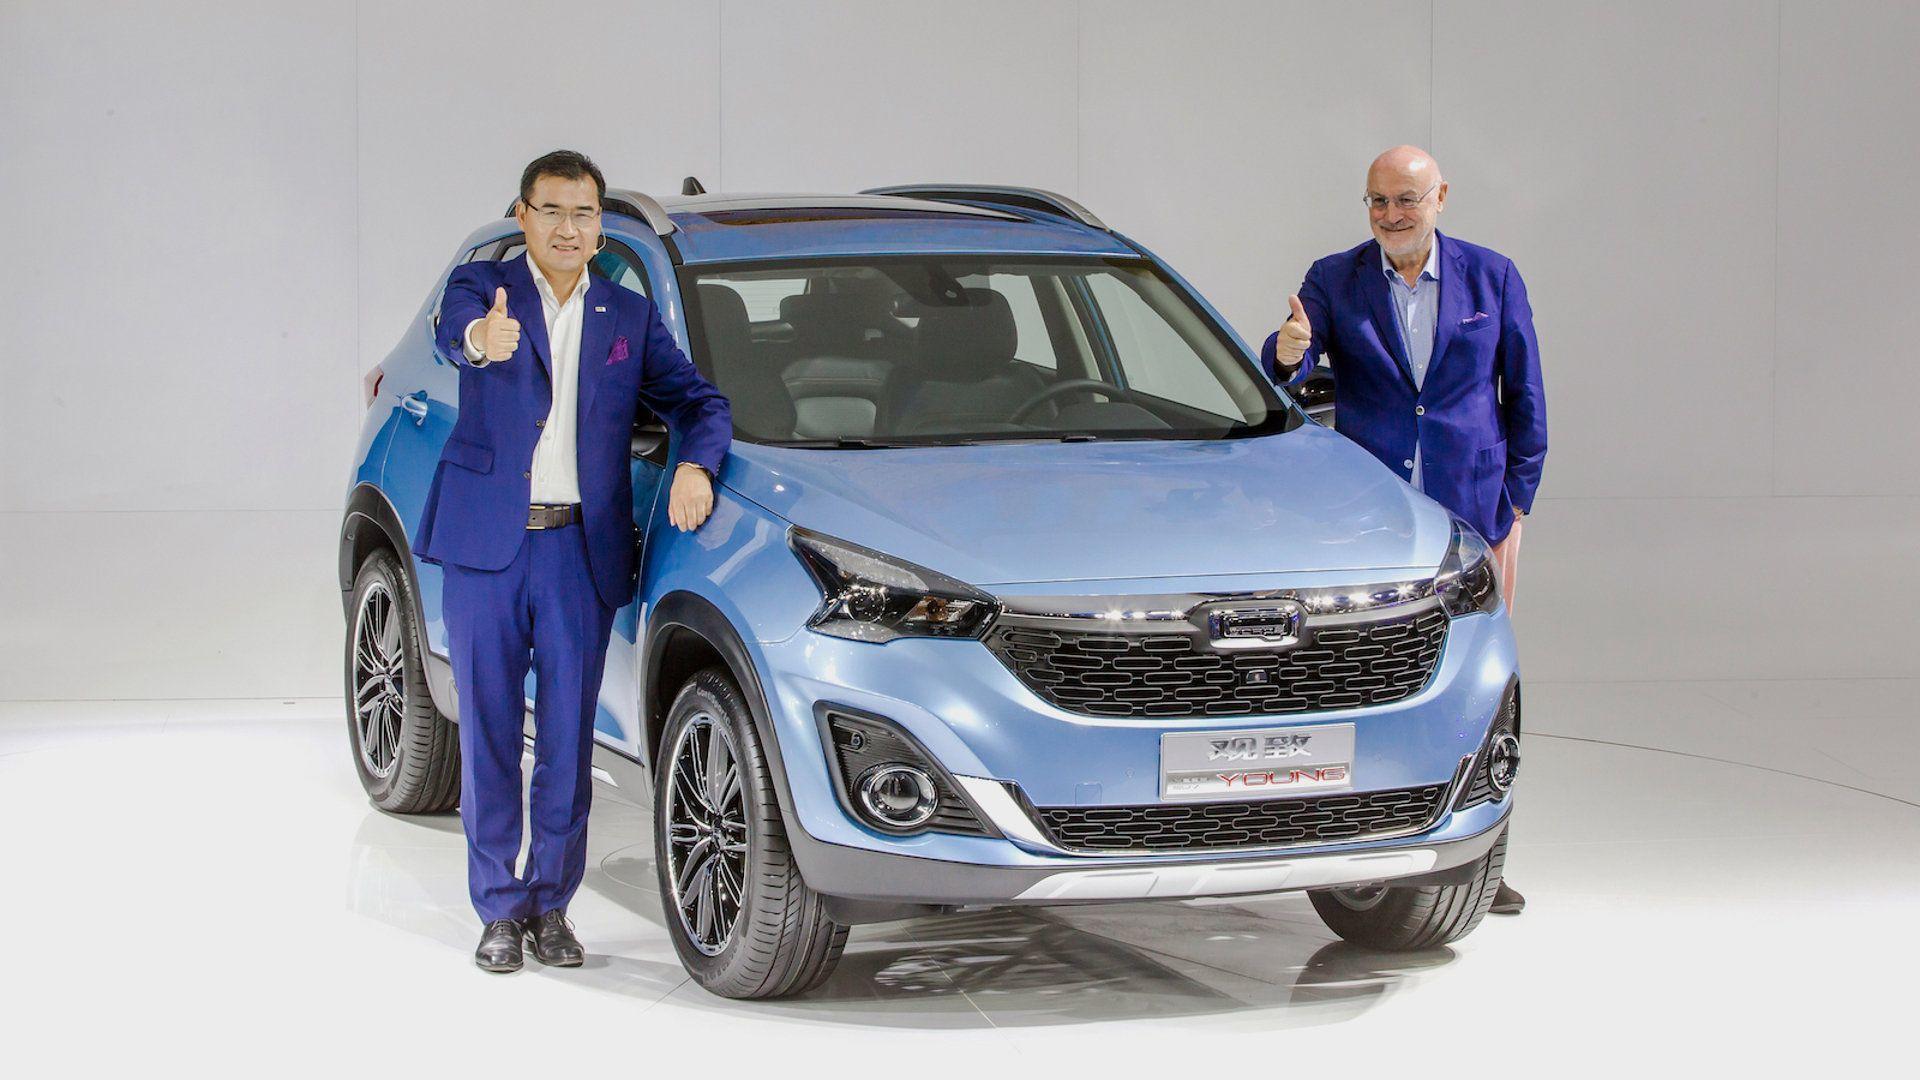 Qoros stellt neuen Kompakt-SUV Young vor - ALLES AUTO